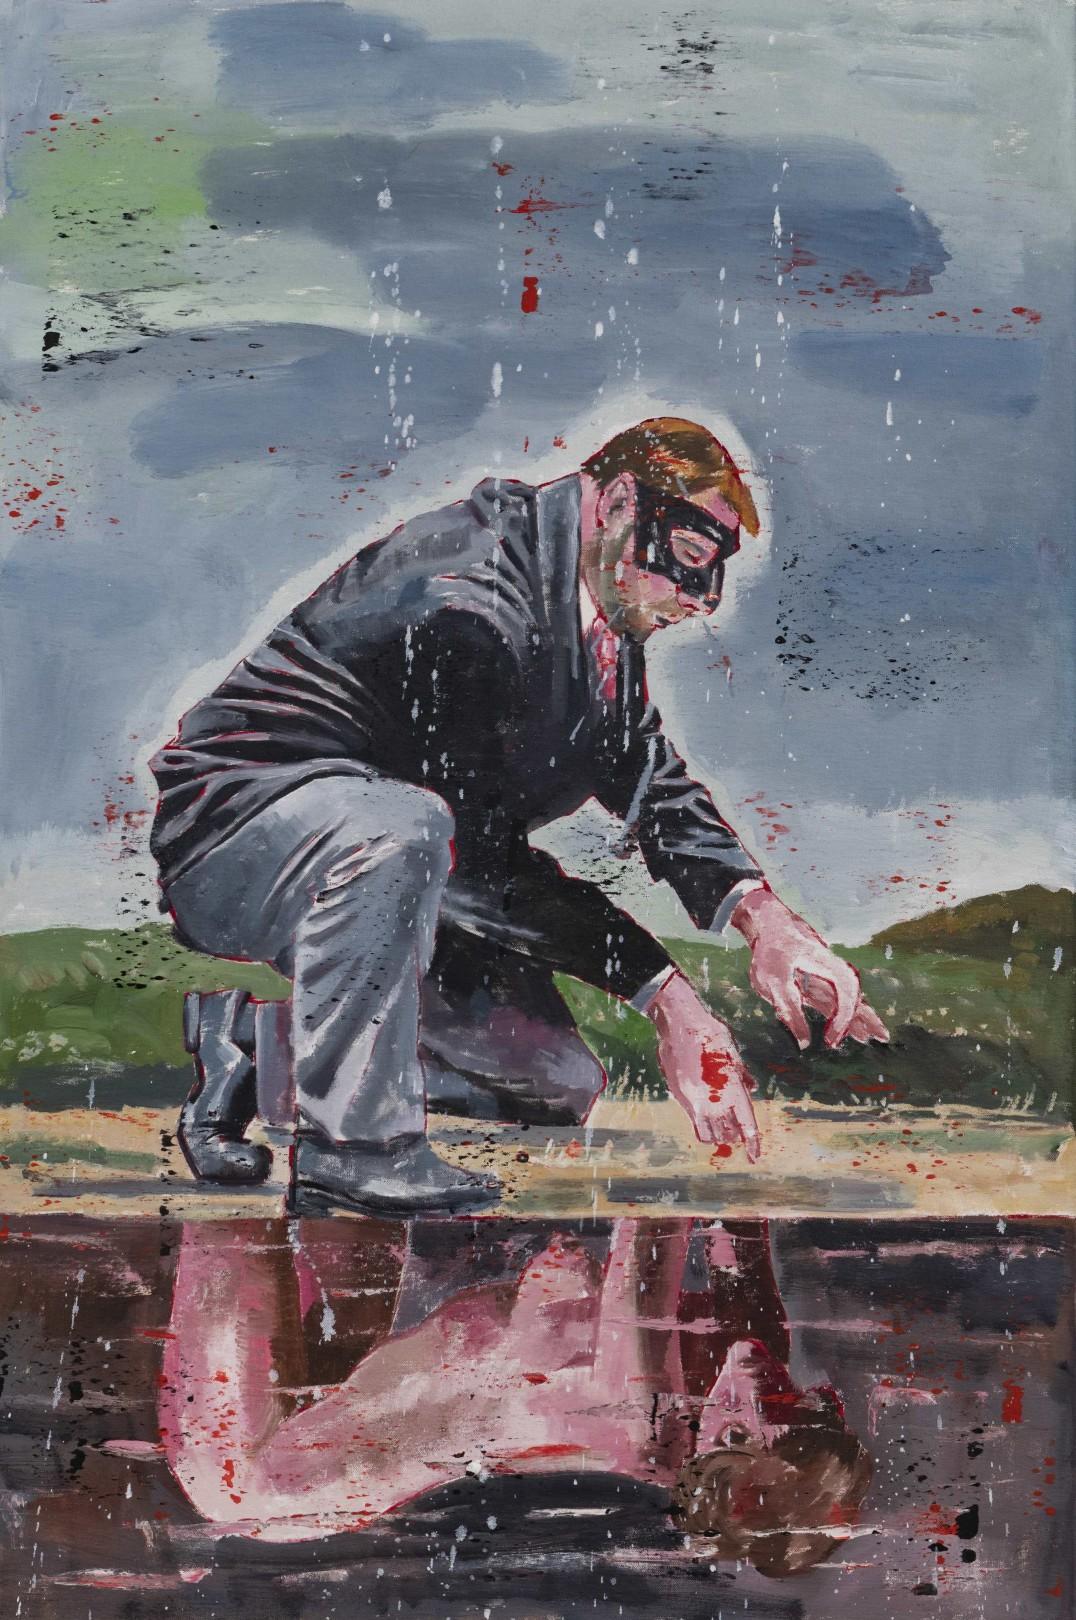 Nicky Nodjoumi Man's Reflection, 2019 Oil on canvas 91 x 61 cm. / 36 x 24 in.